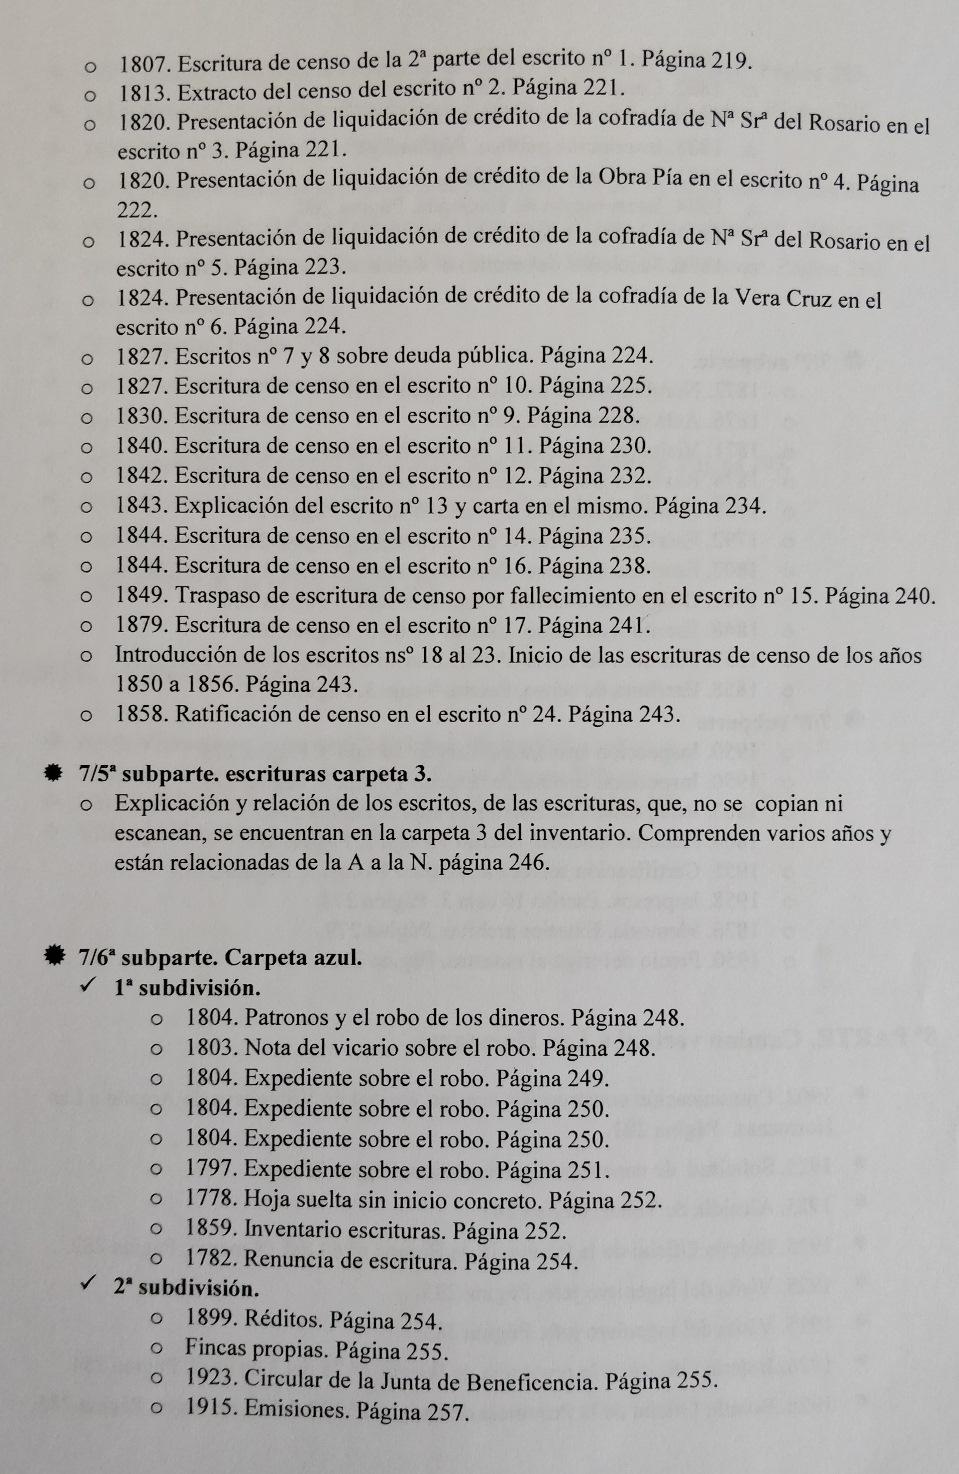 Libros-Alberto-9.jpg